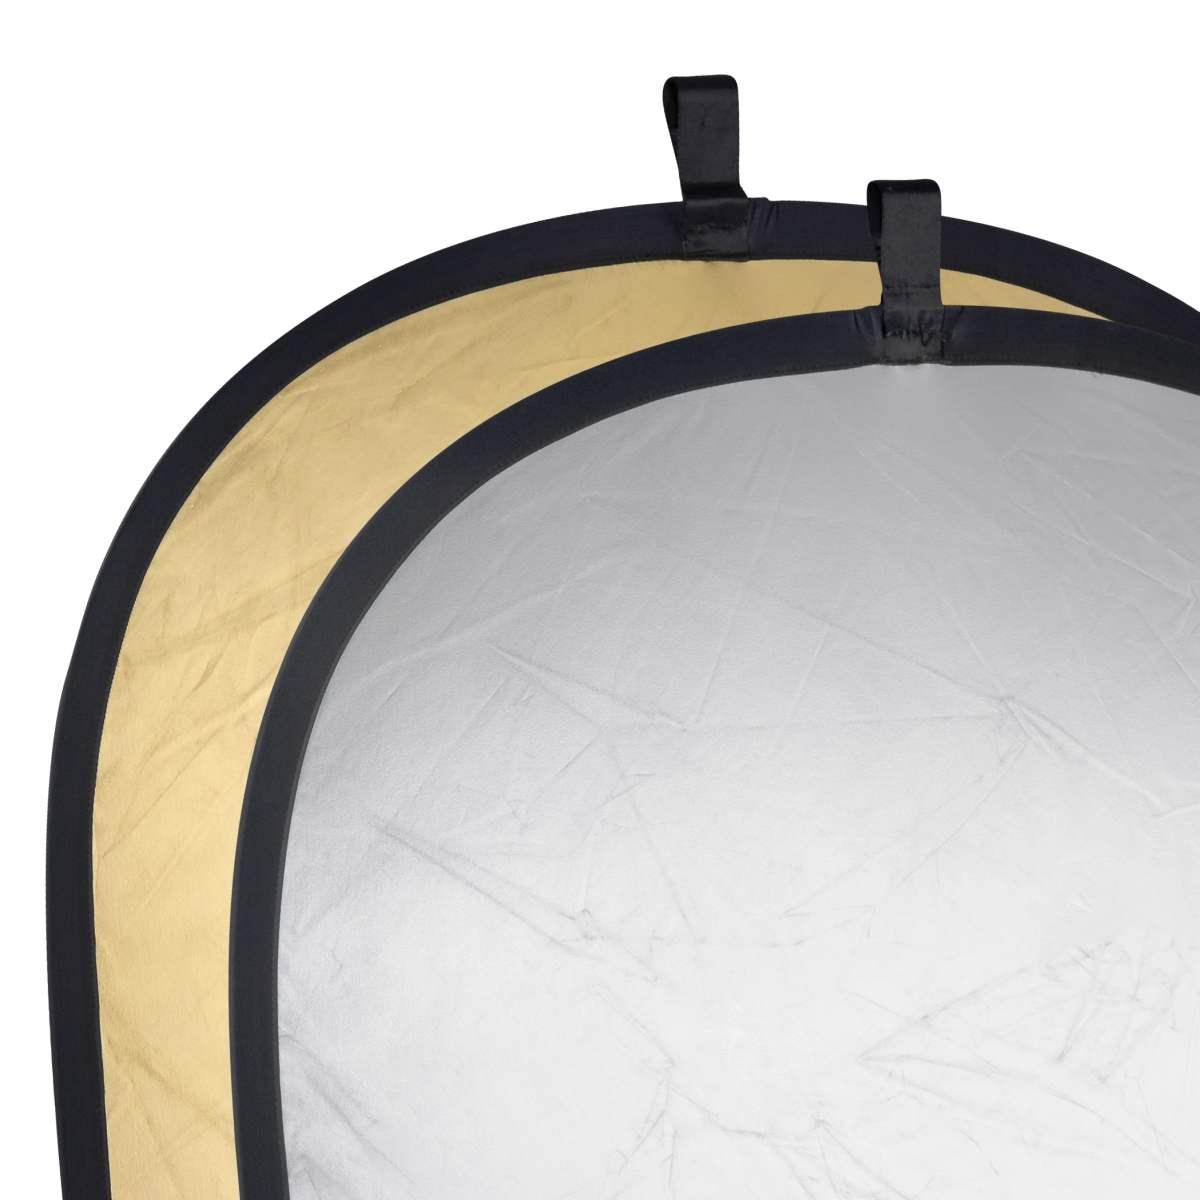 Walimex 2in1 Foldable Reflector silv./gold 145x200